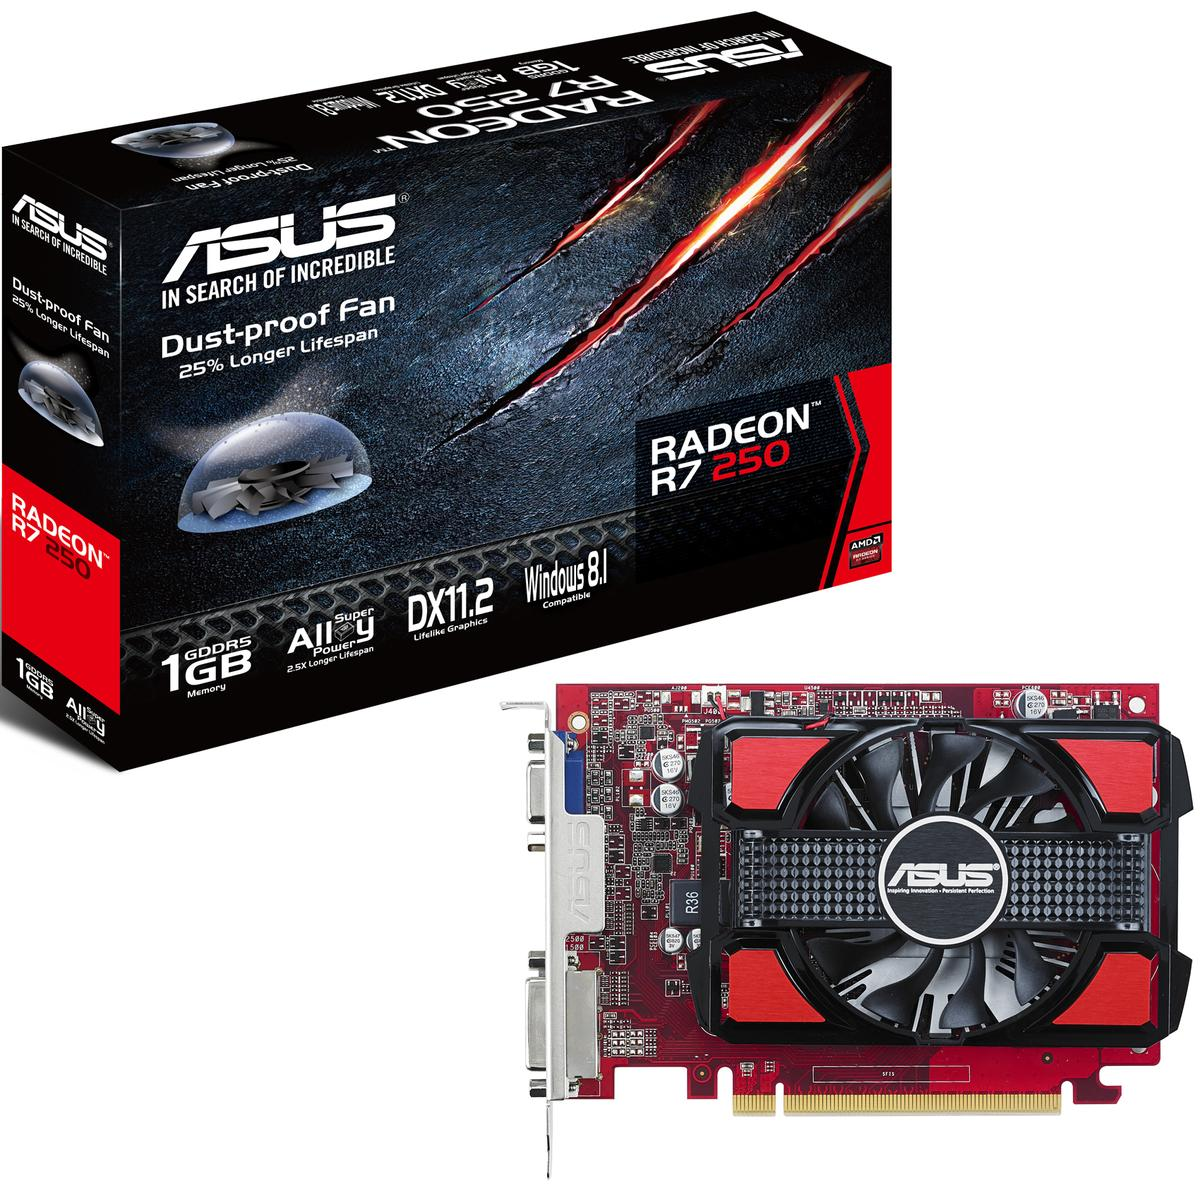 Asus Radeon R7 250 1GB Radeon R7 200 Series